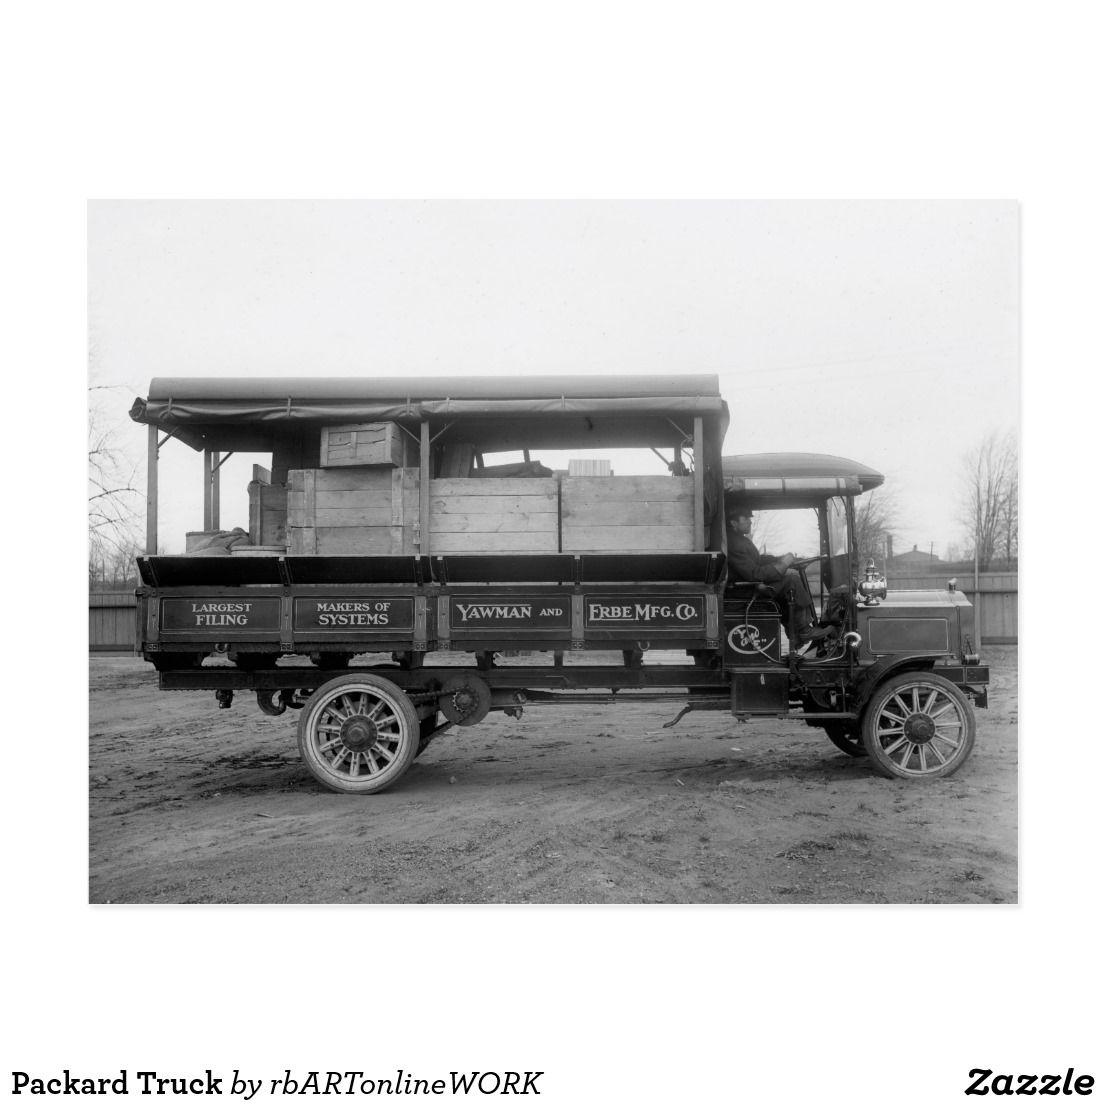 Park Art My WordPress Blog_Cincinnati Ohio Craigslist Cars And Trucks For Sale By Owner